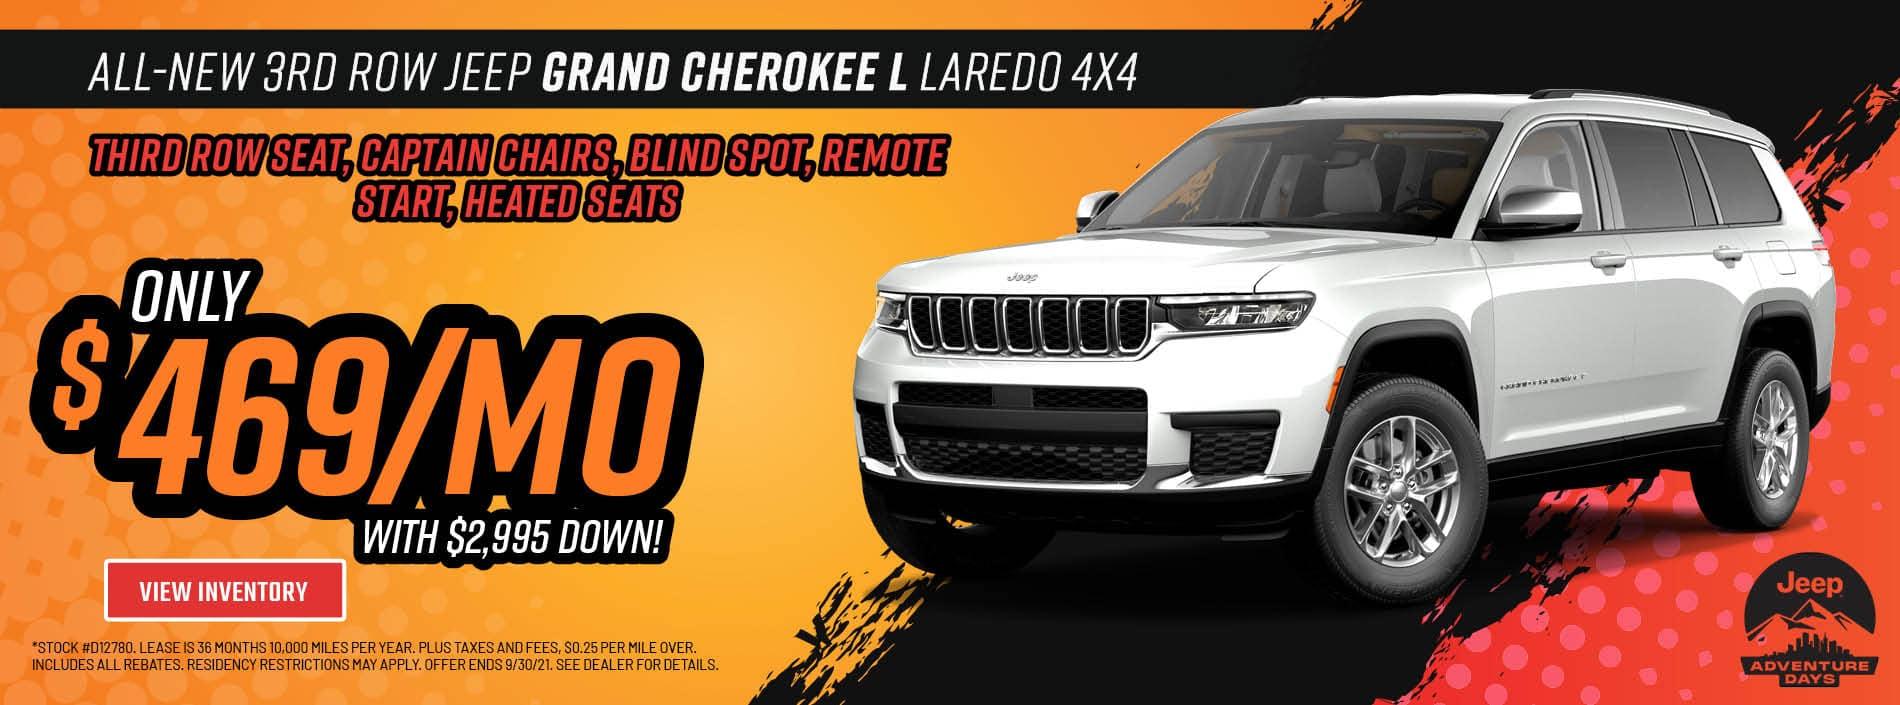 All-New 3rd Row 2021 Jeep Grand Cherokee L Laredo 4x4